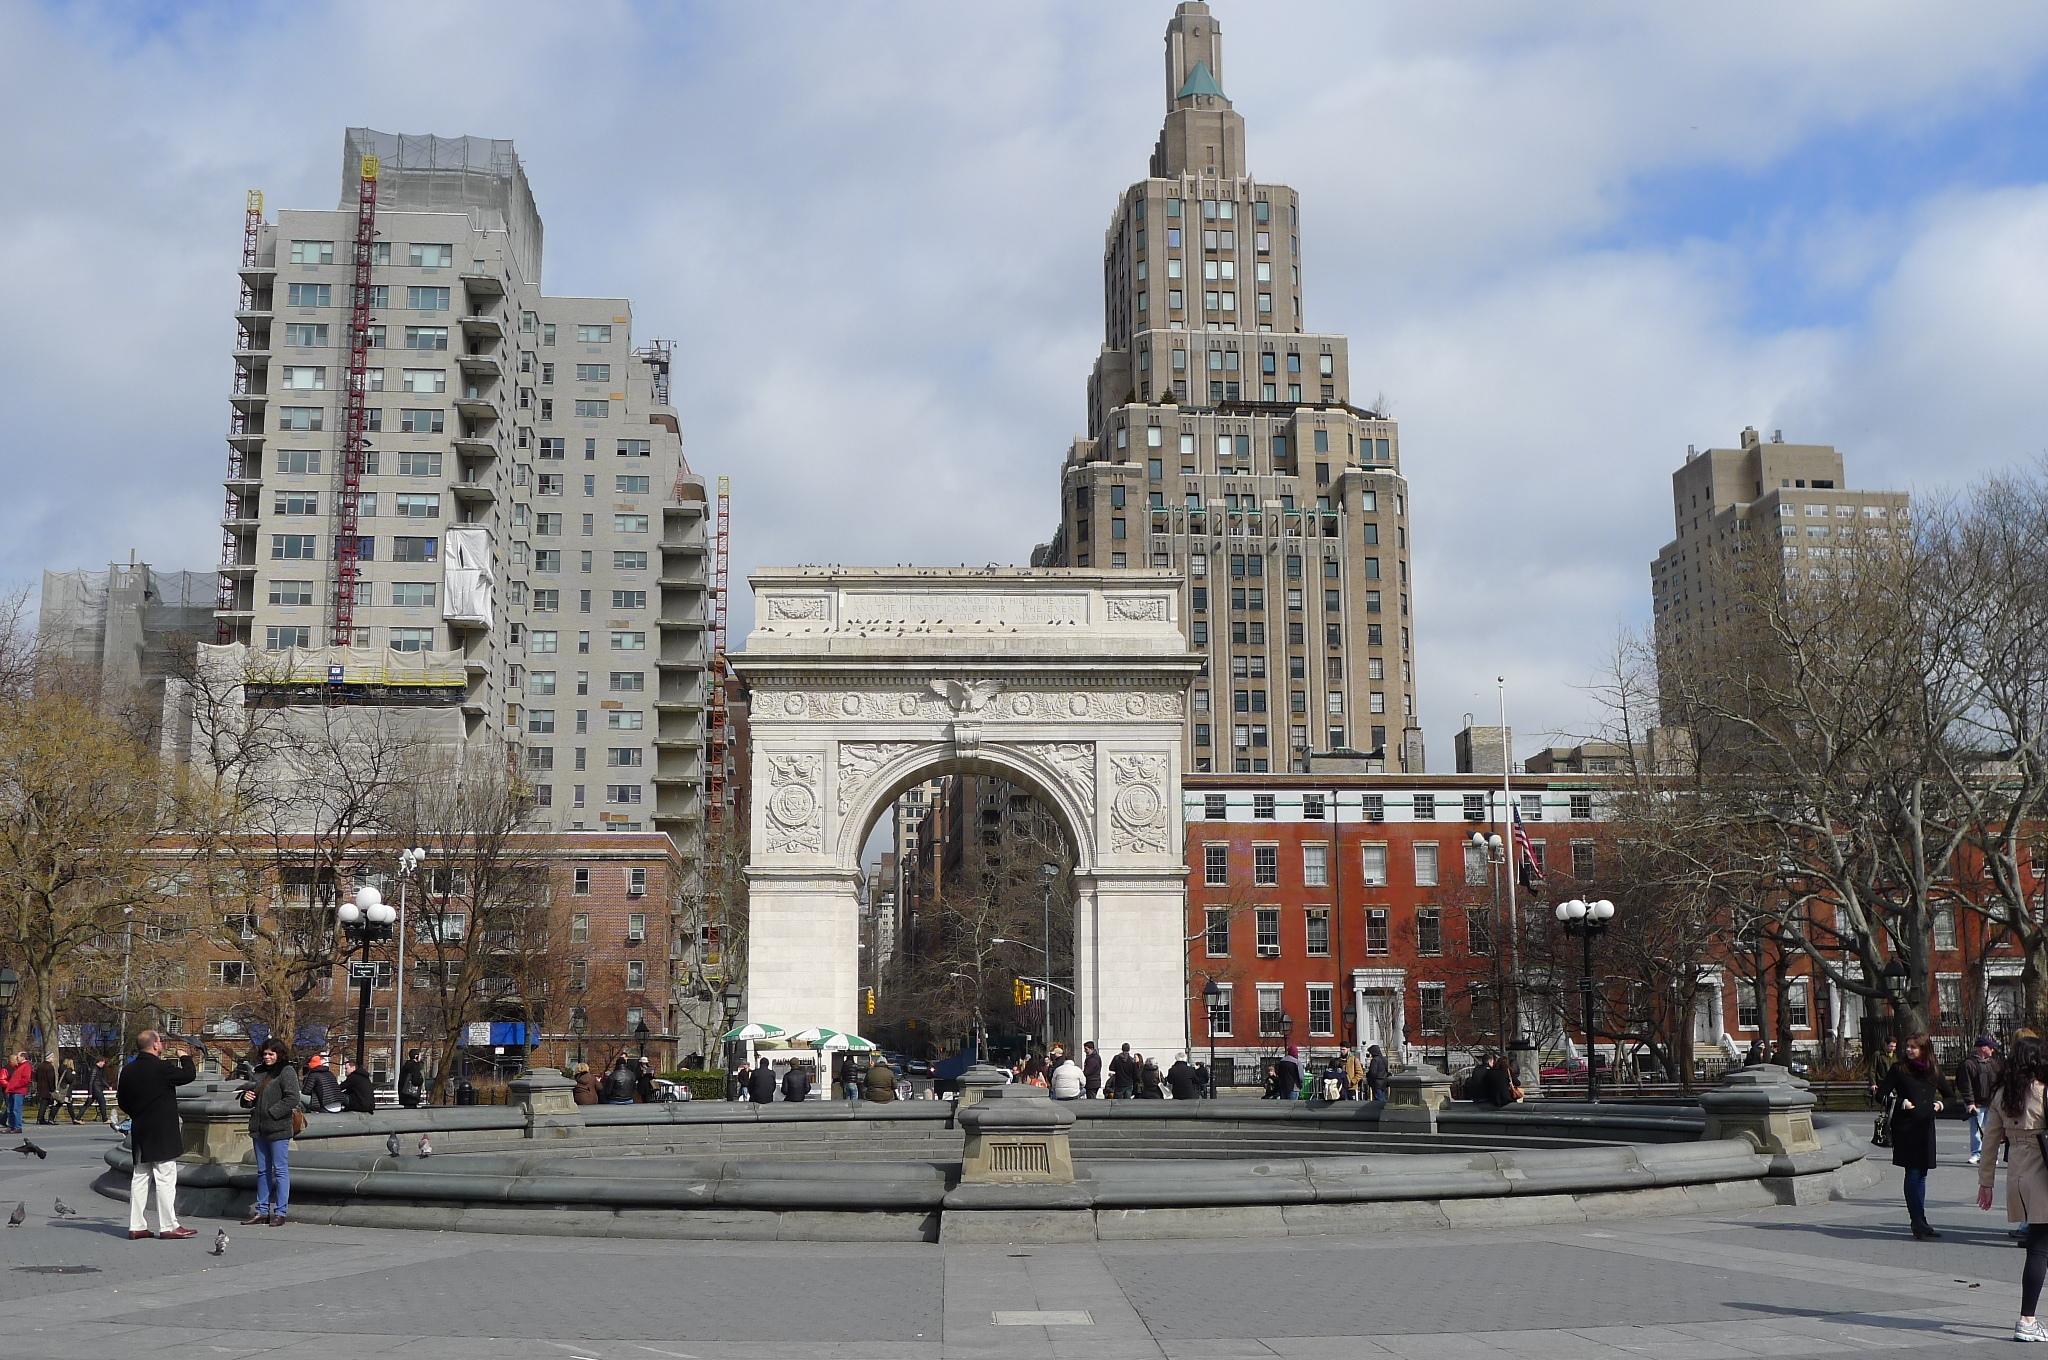 A white triumphal arch against the skyline.